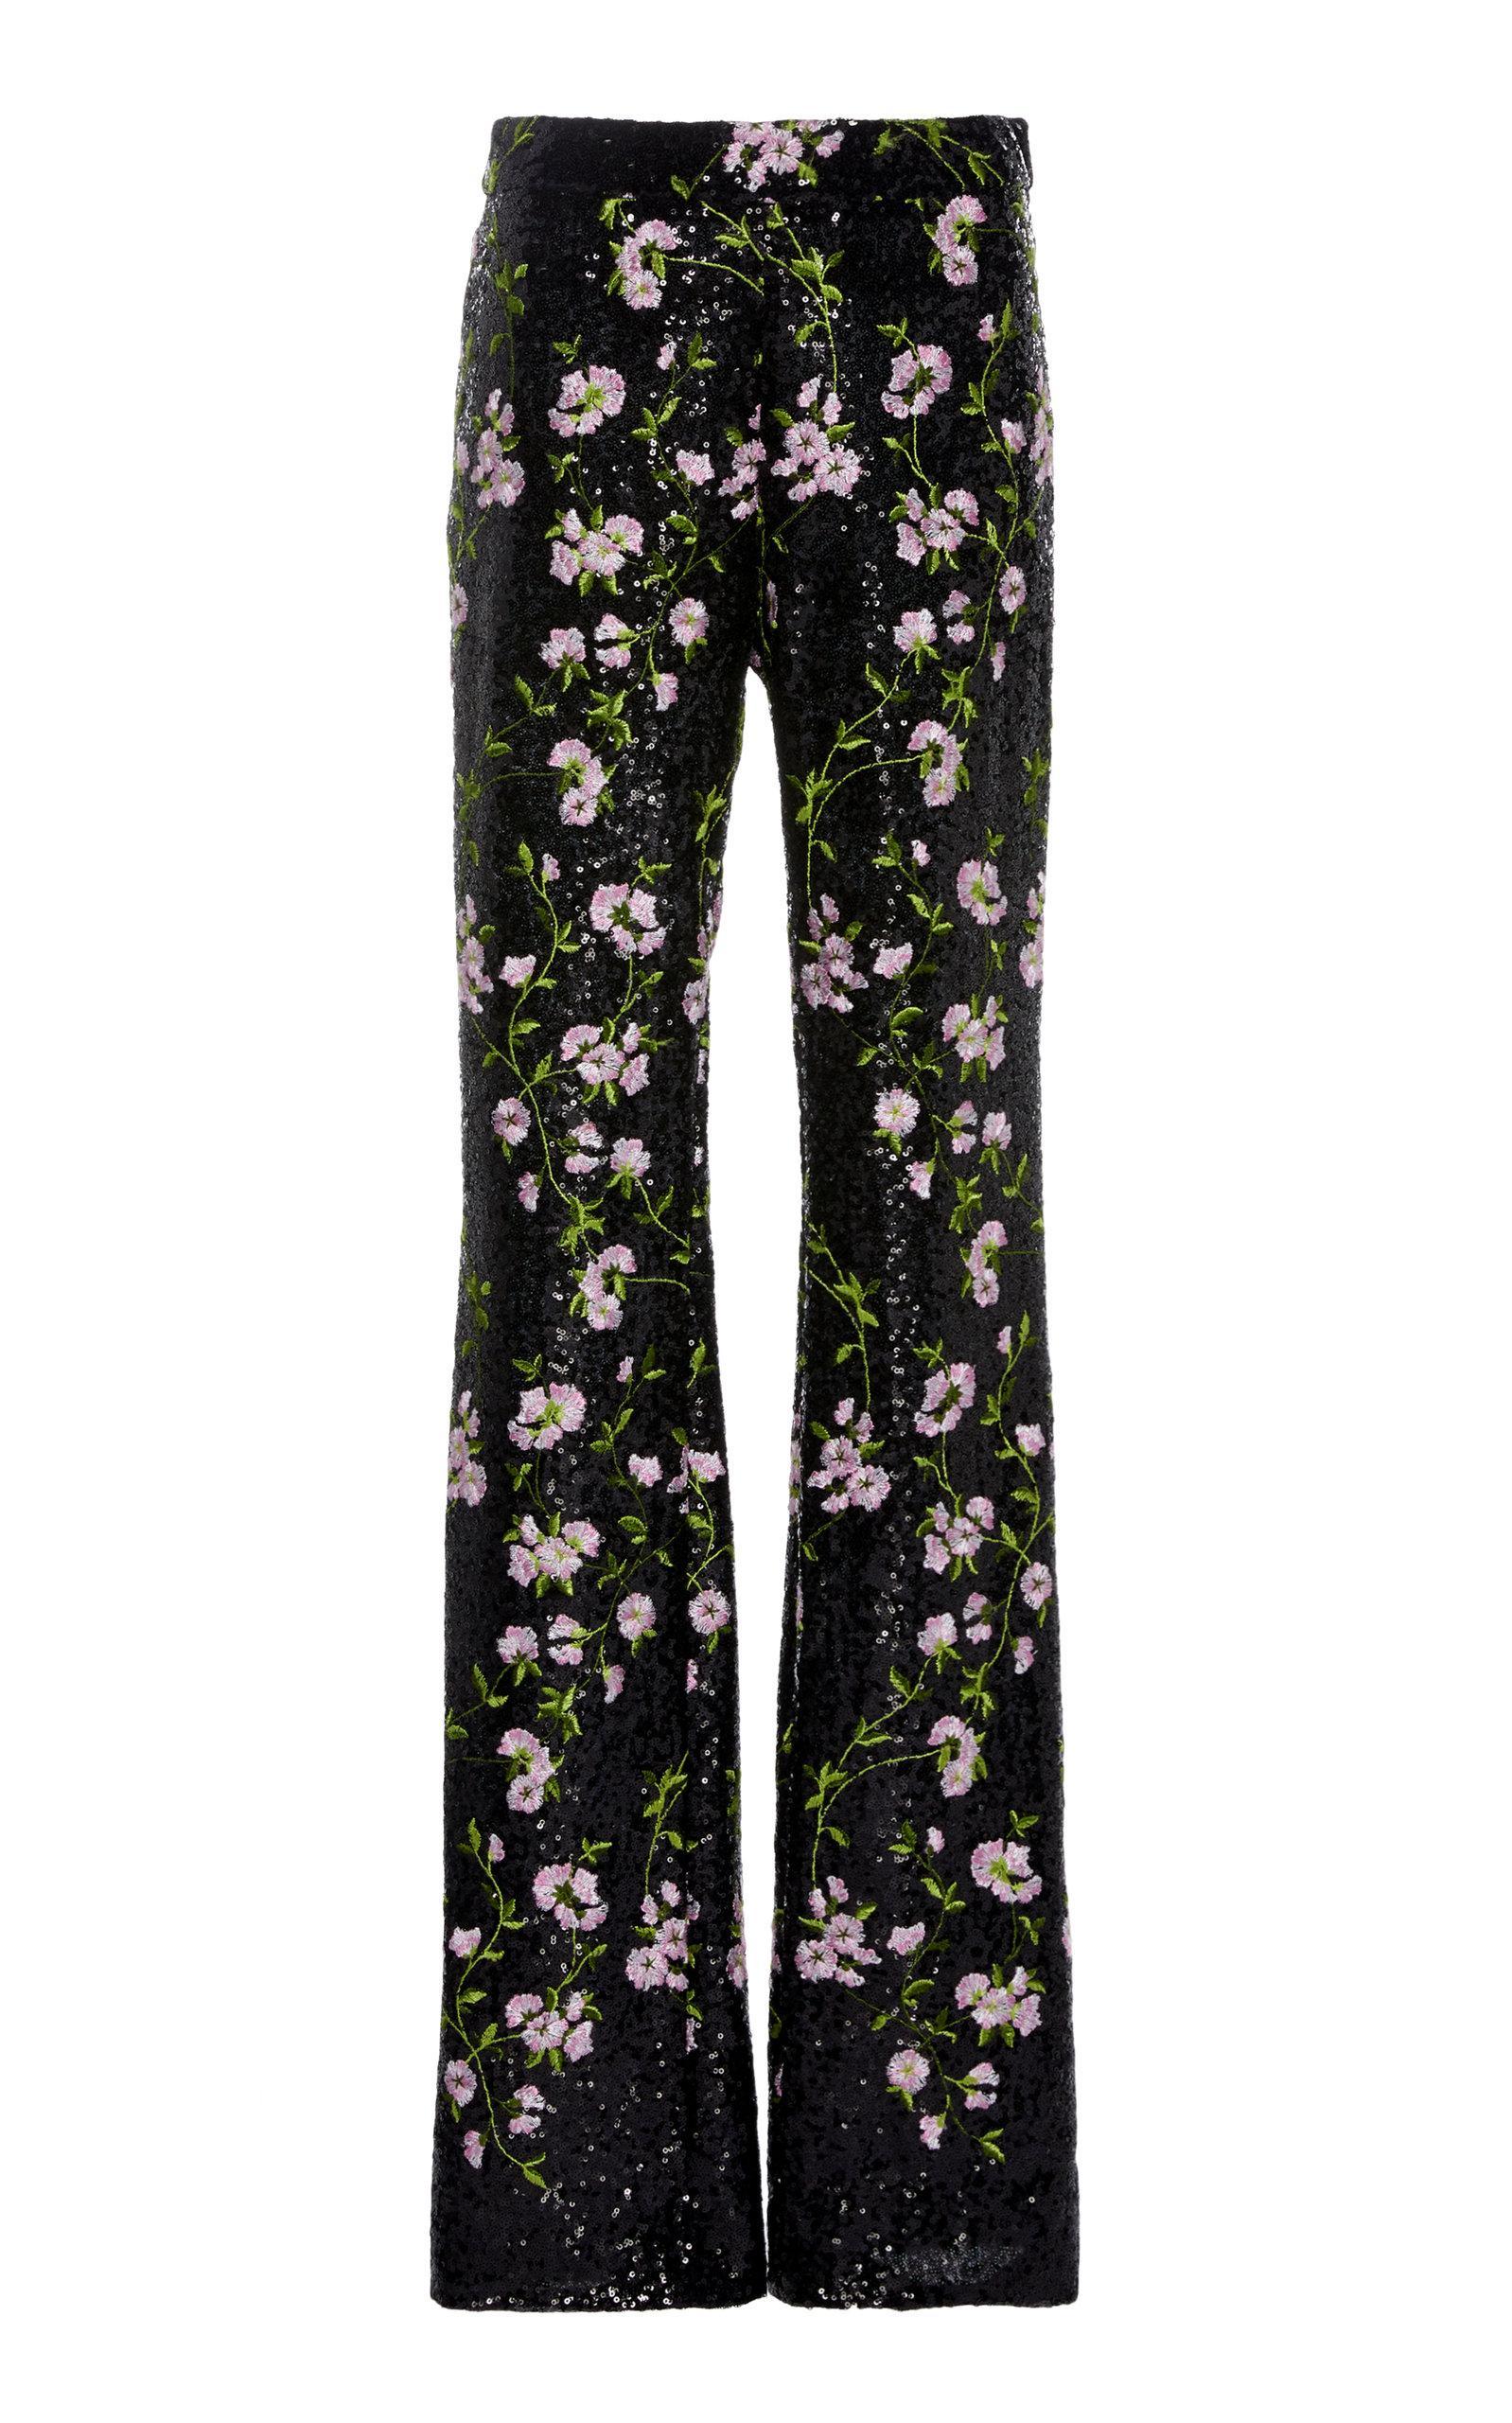 59faa70e08b7 Giambattista Valli Sequin Embroidered Flared Leg Pants With Floral ...